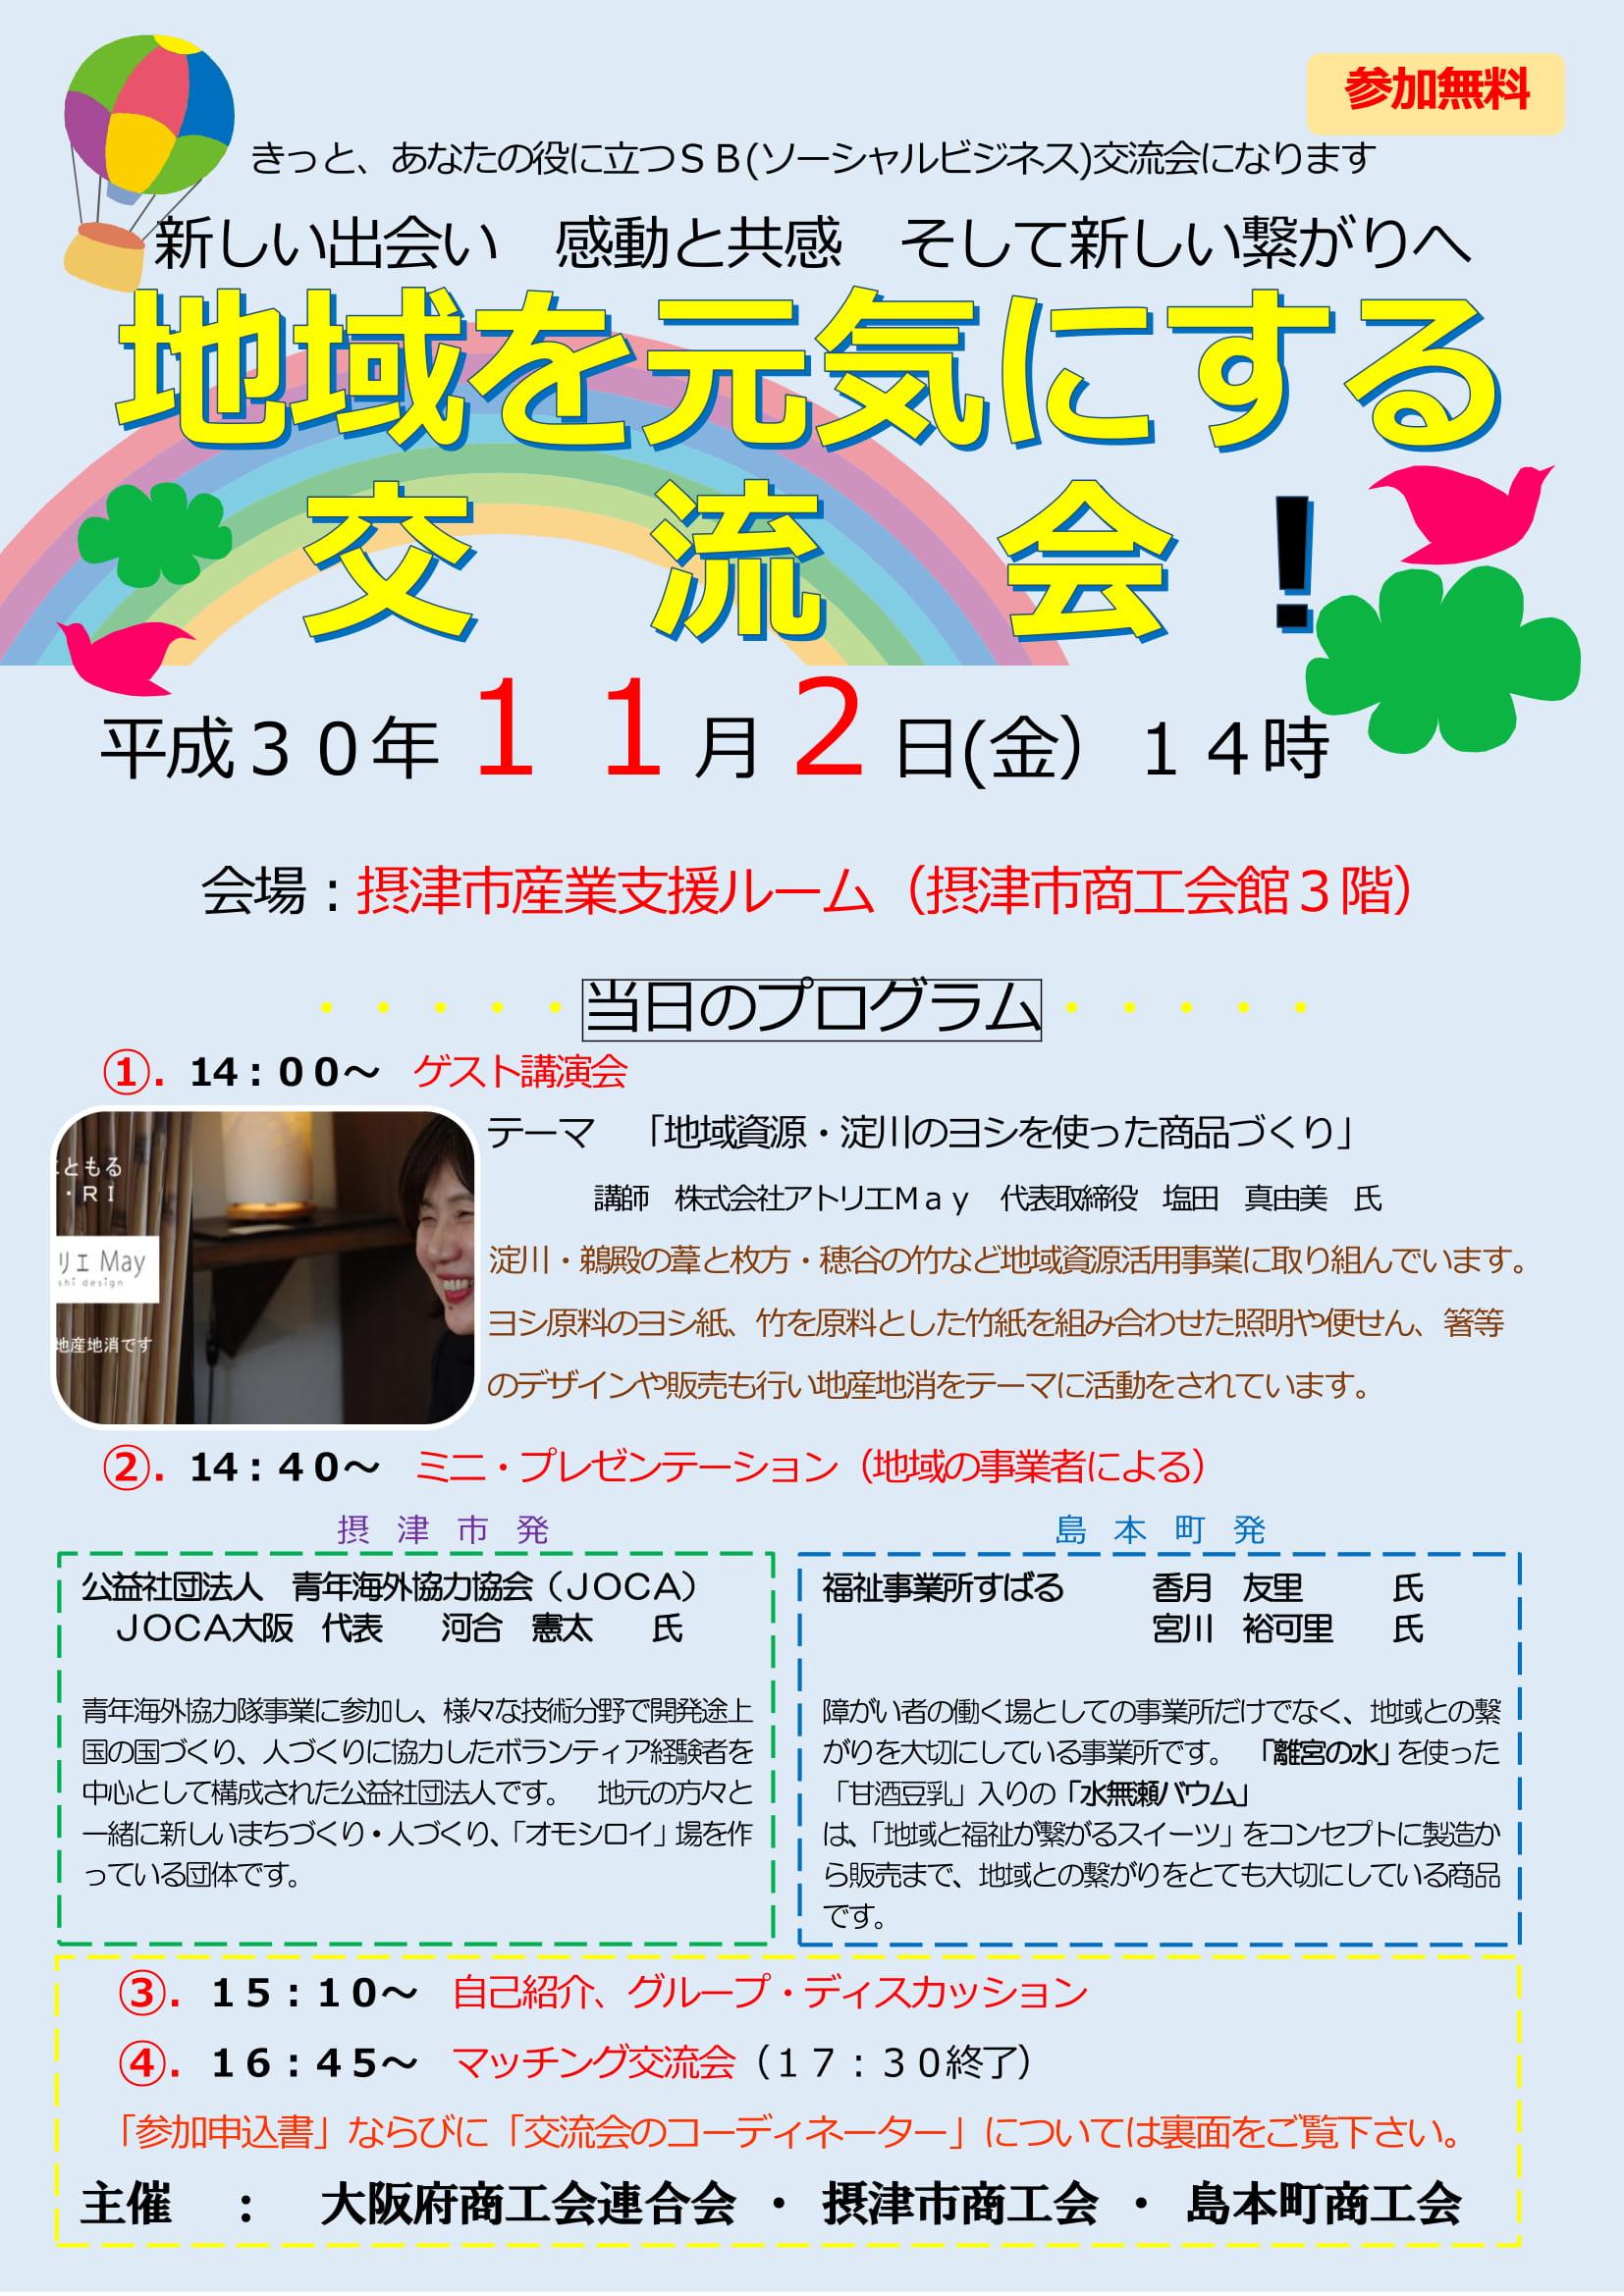 11/2 SB交流会のチラシ(島本町商工会用)-1